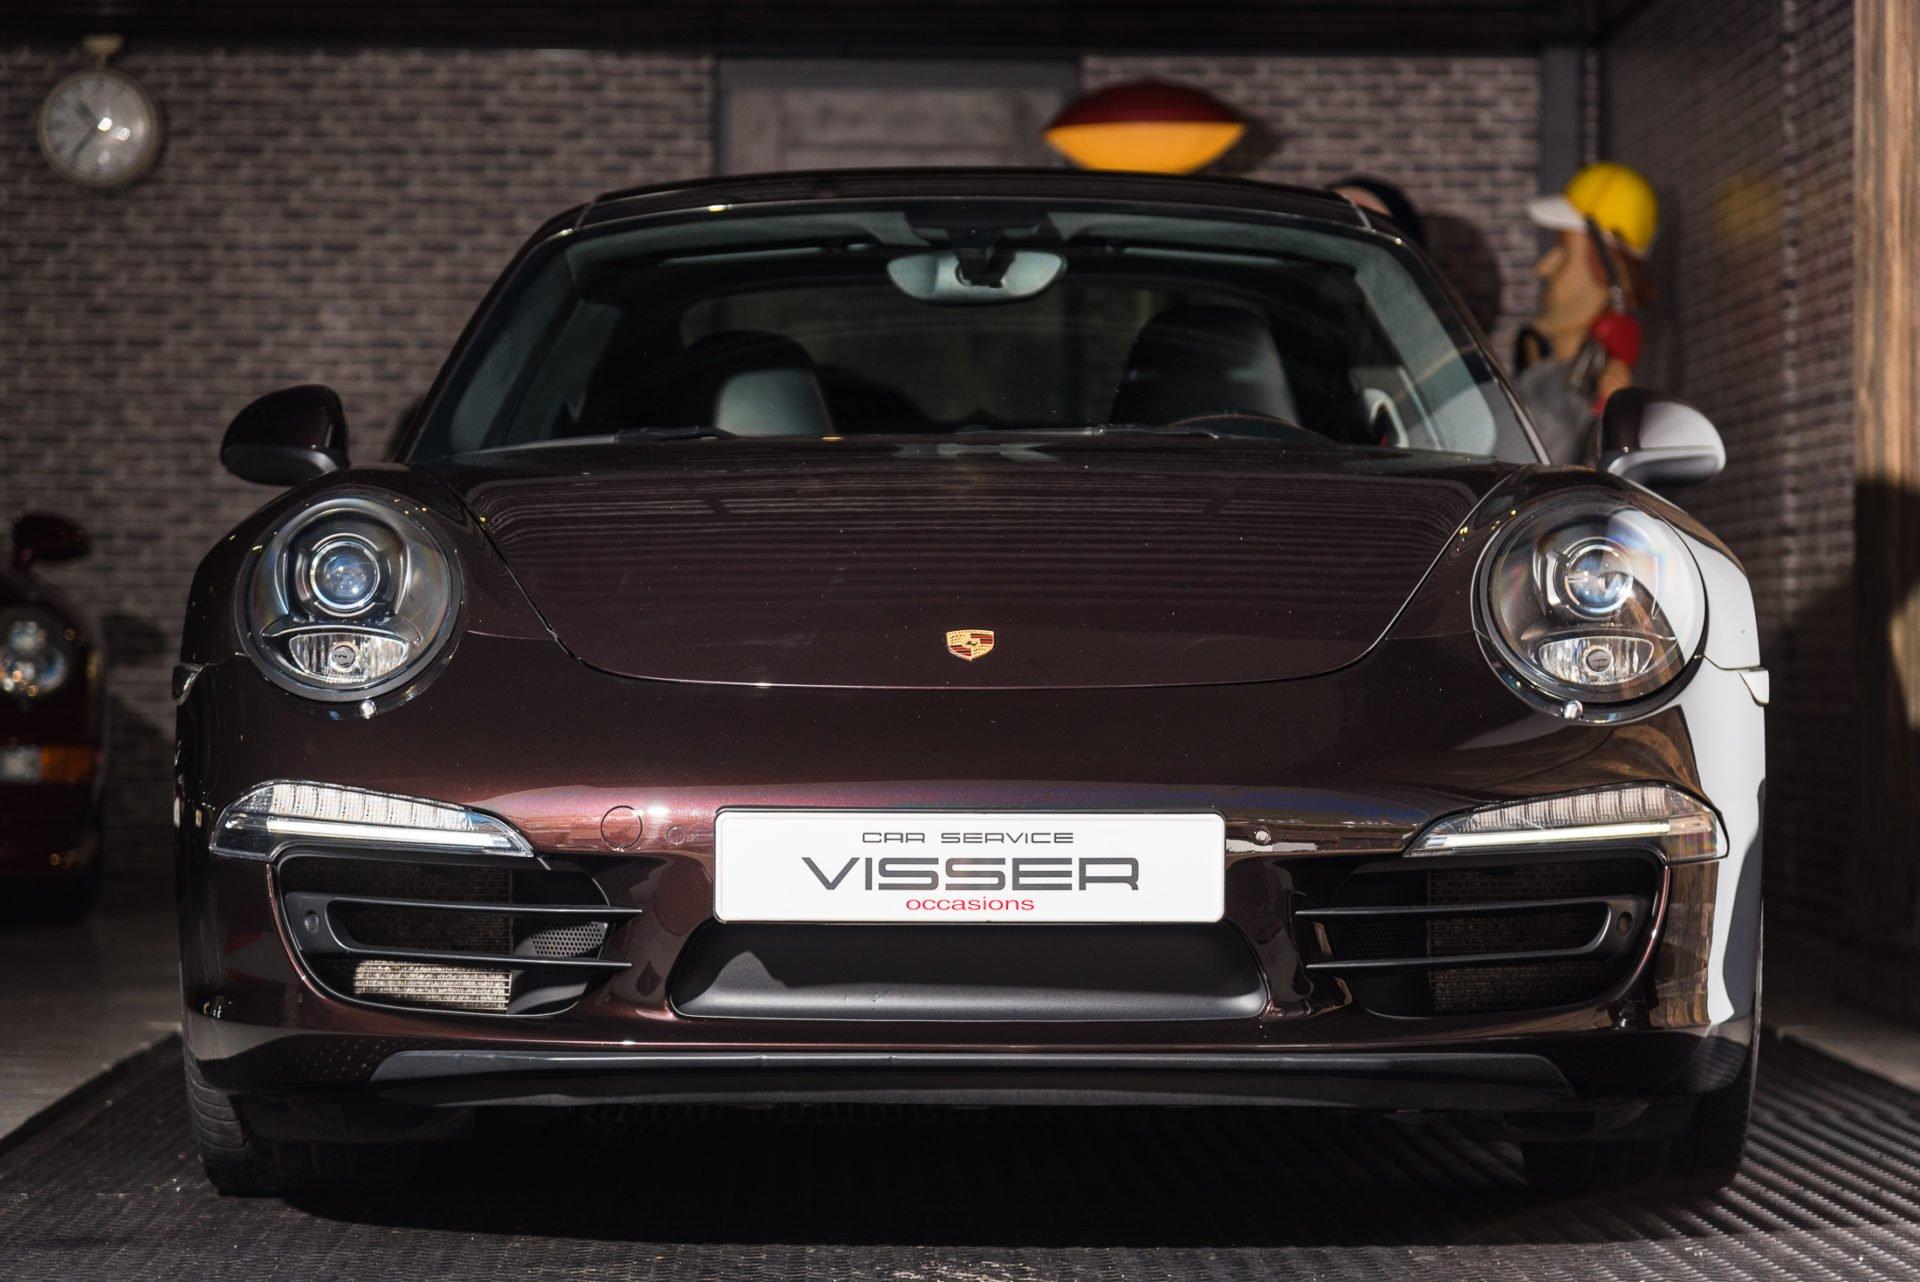 Porsche 991 Carrera 4S -2